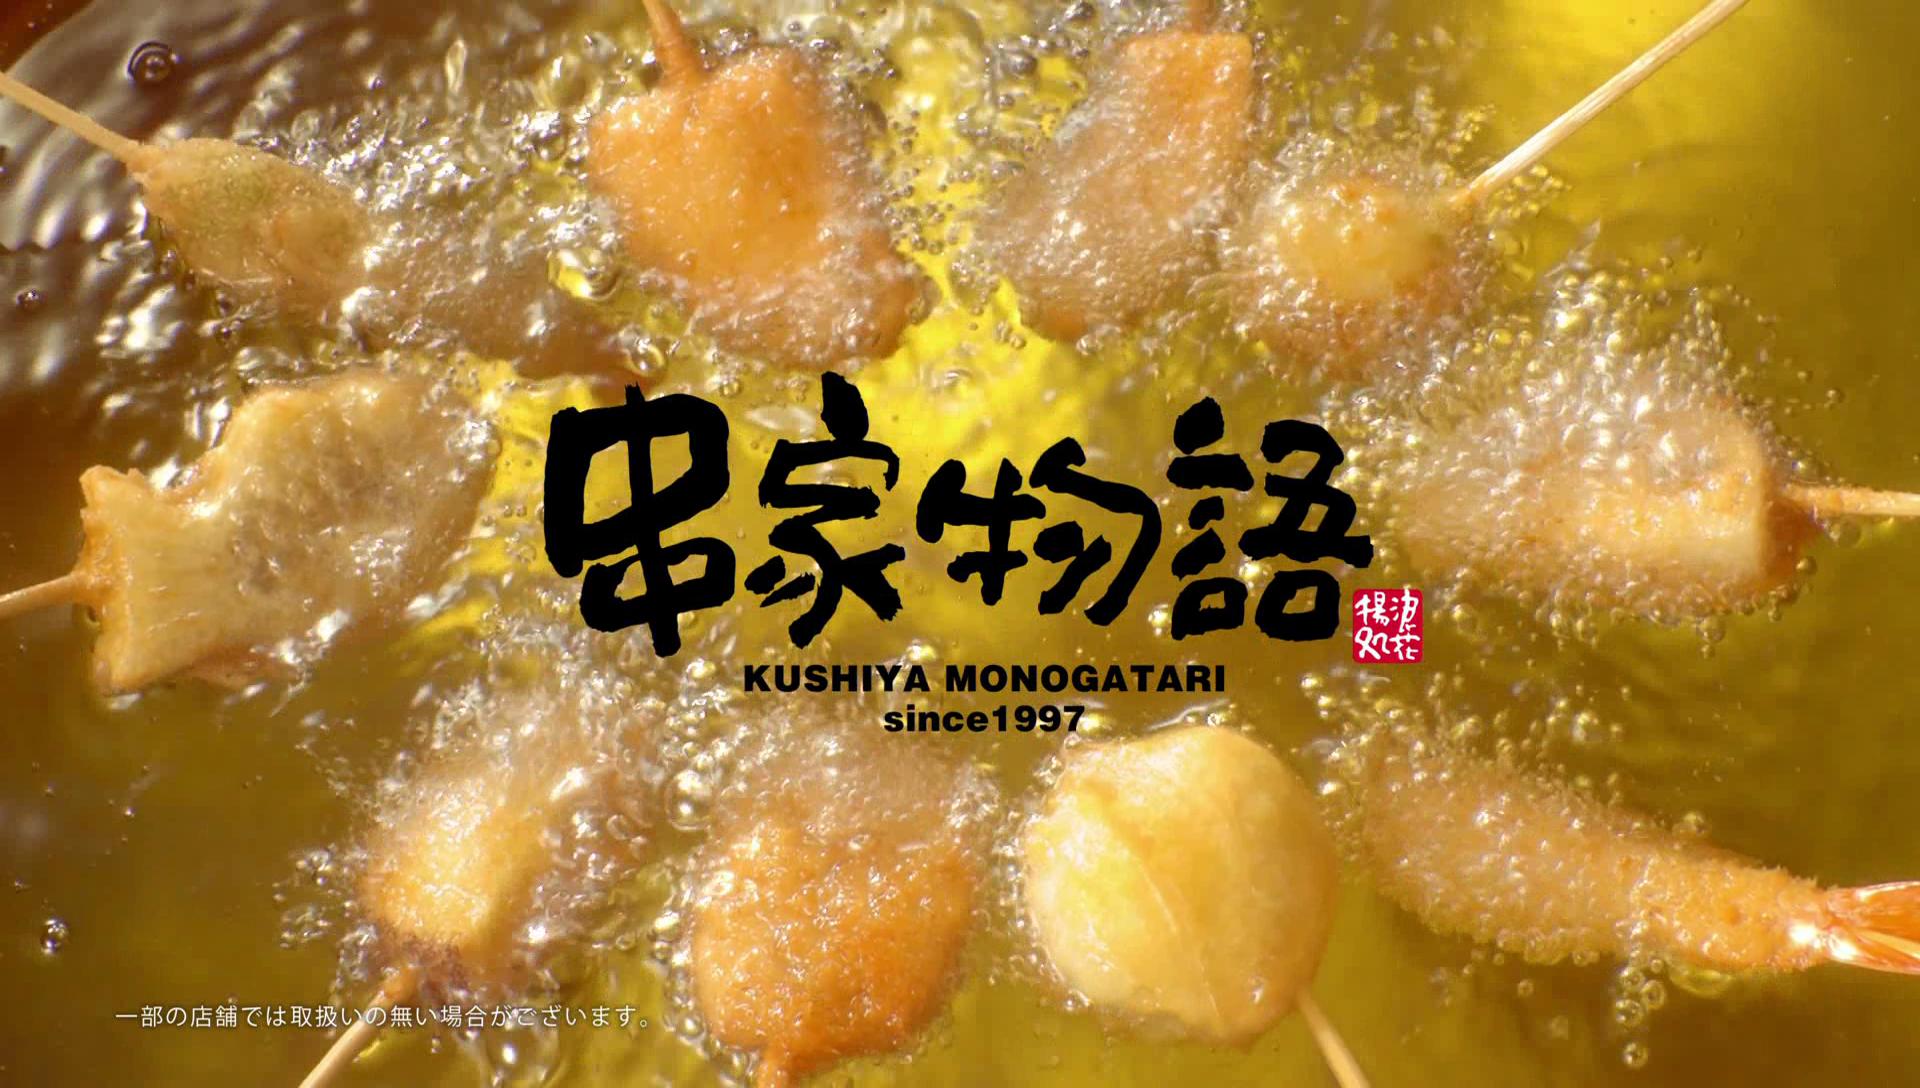 http://www.kushi-ya.com/news/vlcsnap-error198.png